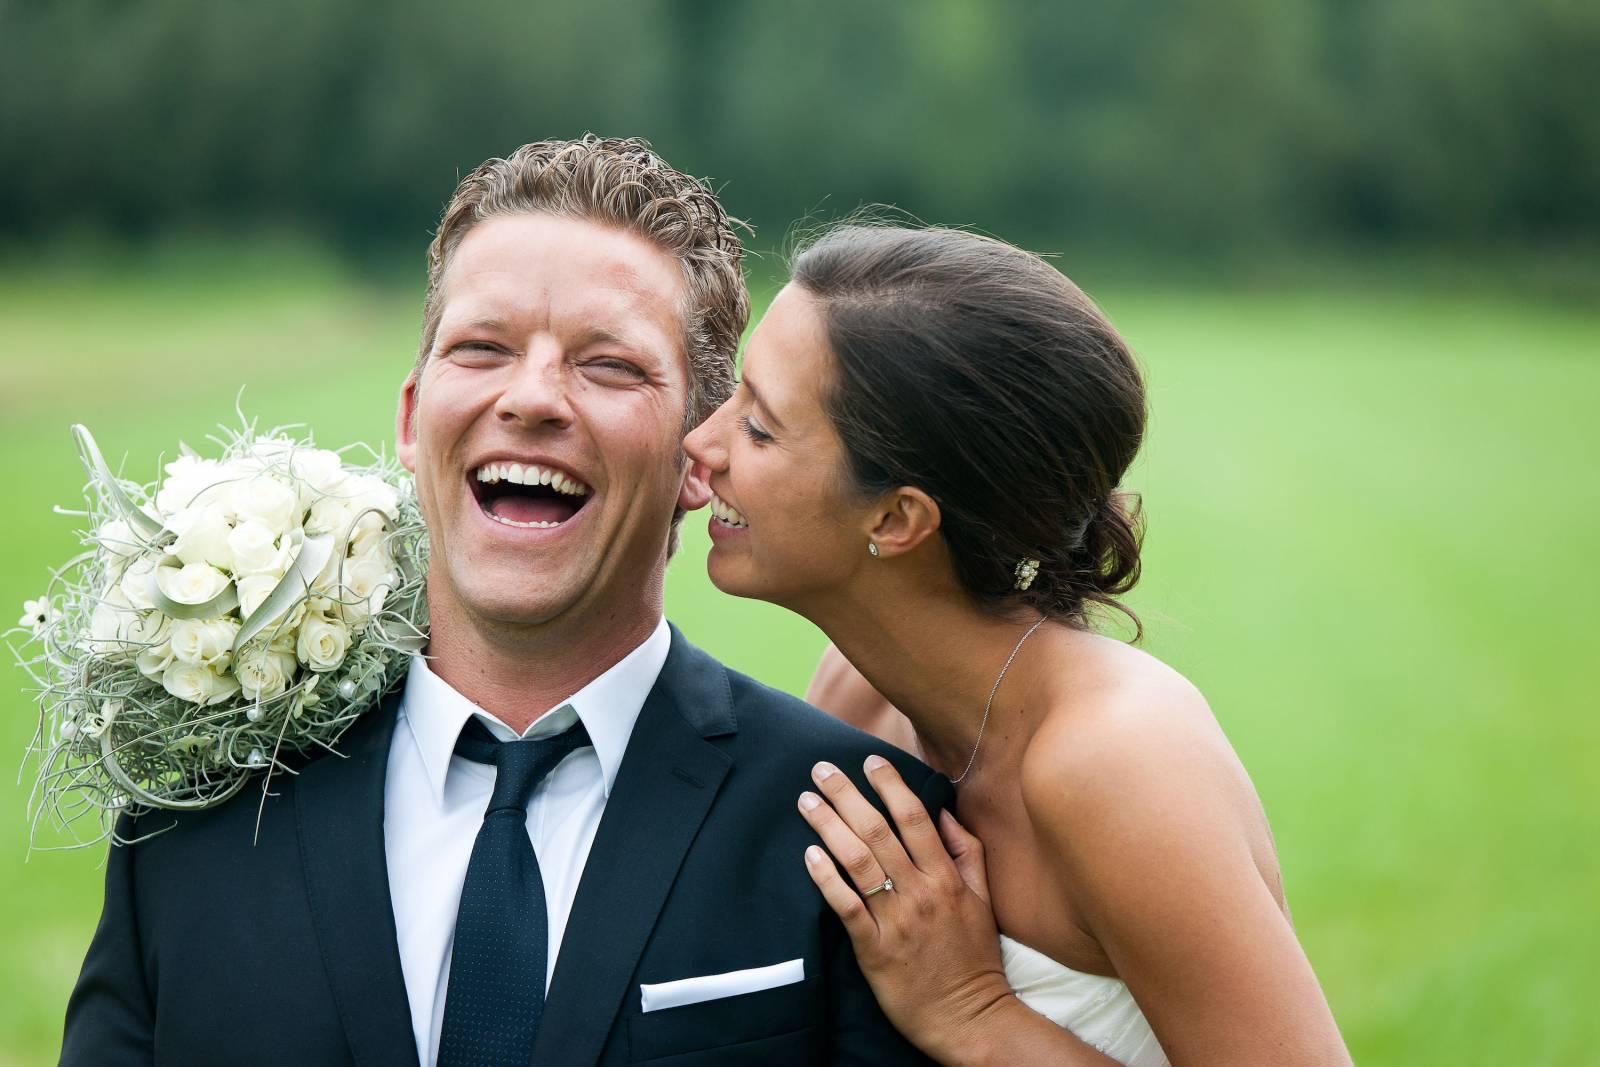 Foto Meeuw - House of Weddings - 7